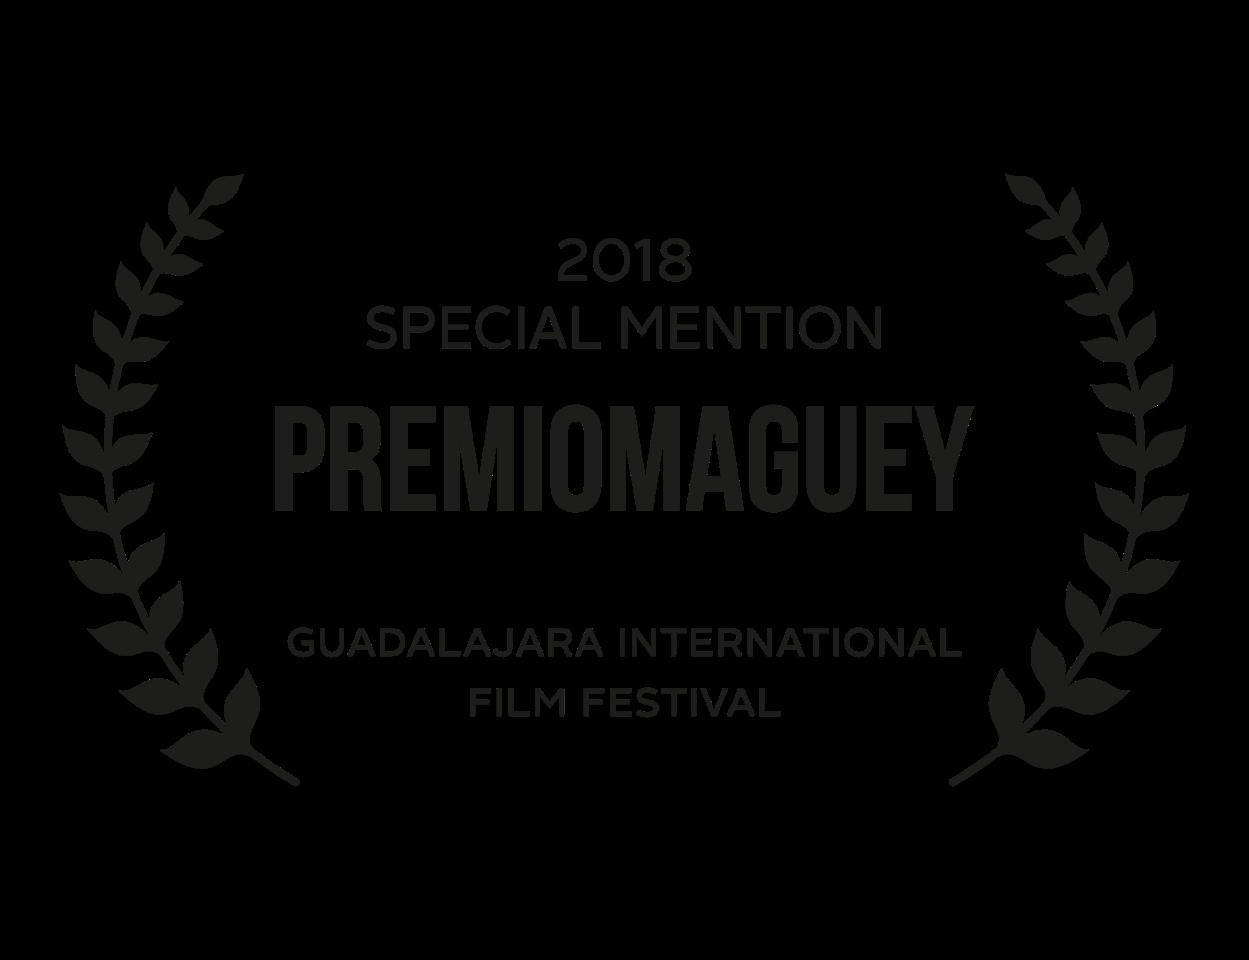 Premio Maguey - Laurel 2018 Special Mention (2).png